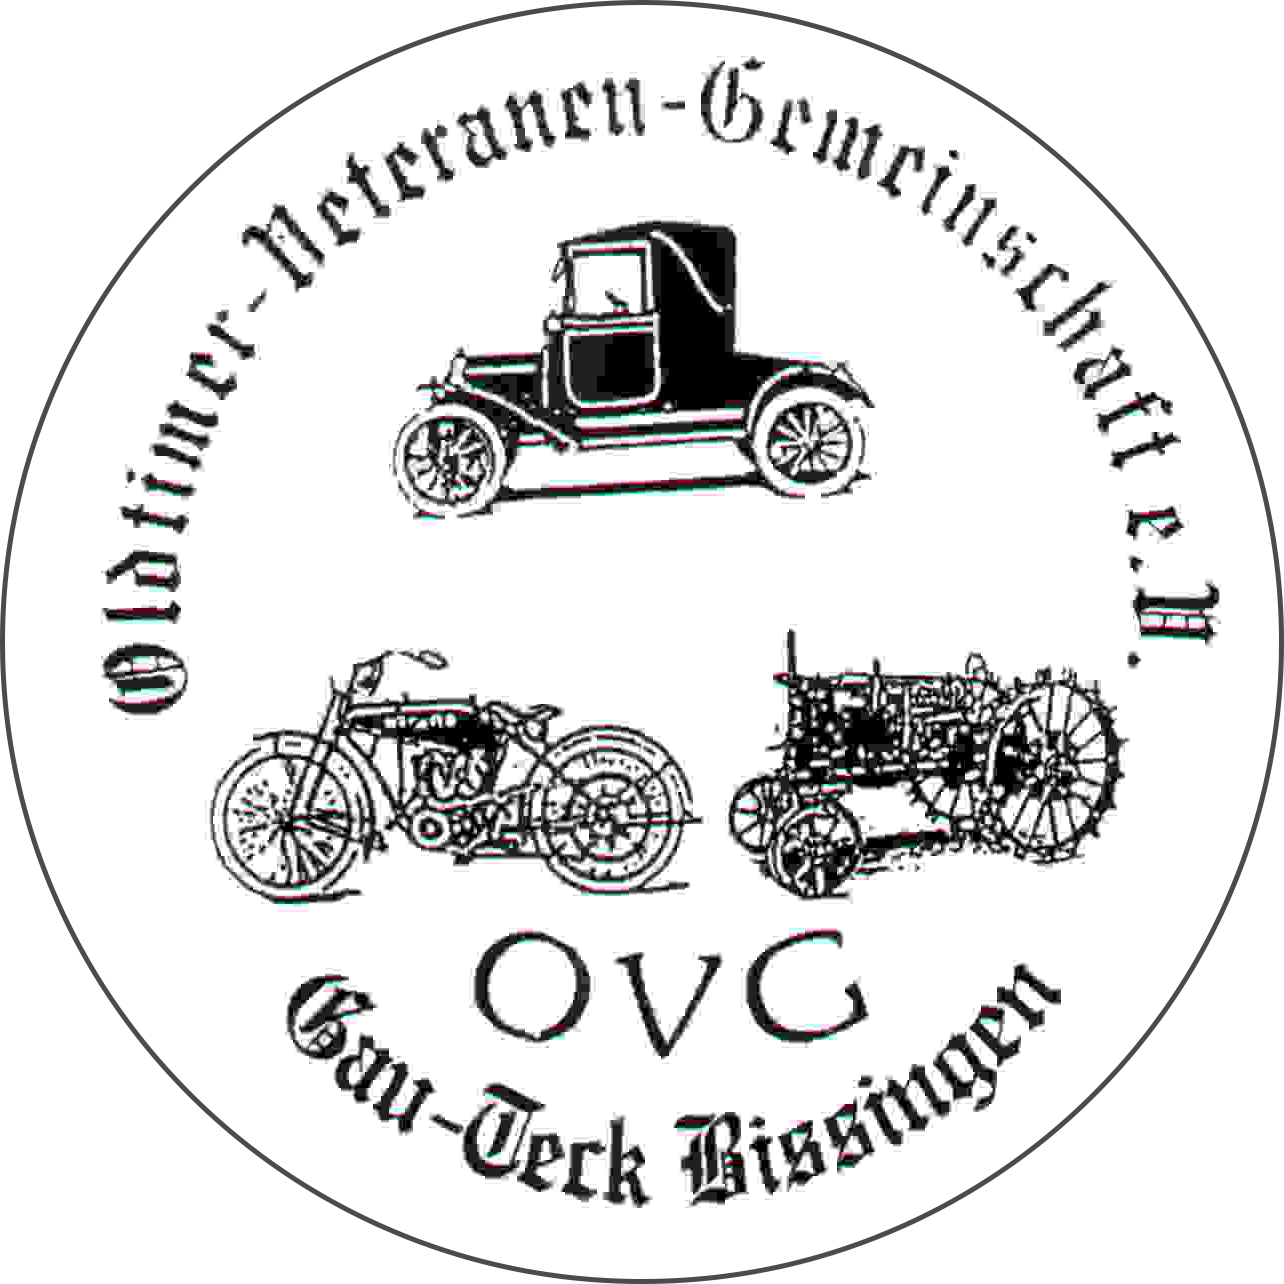 OVG Teck